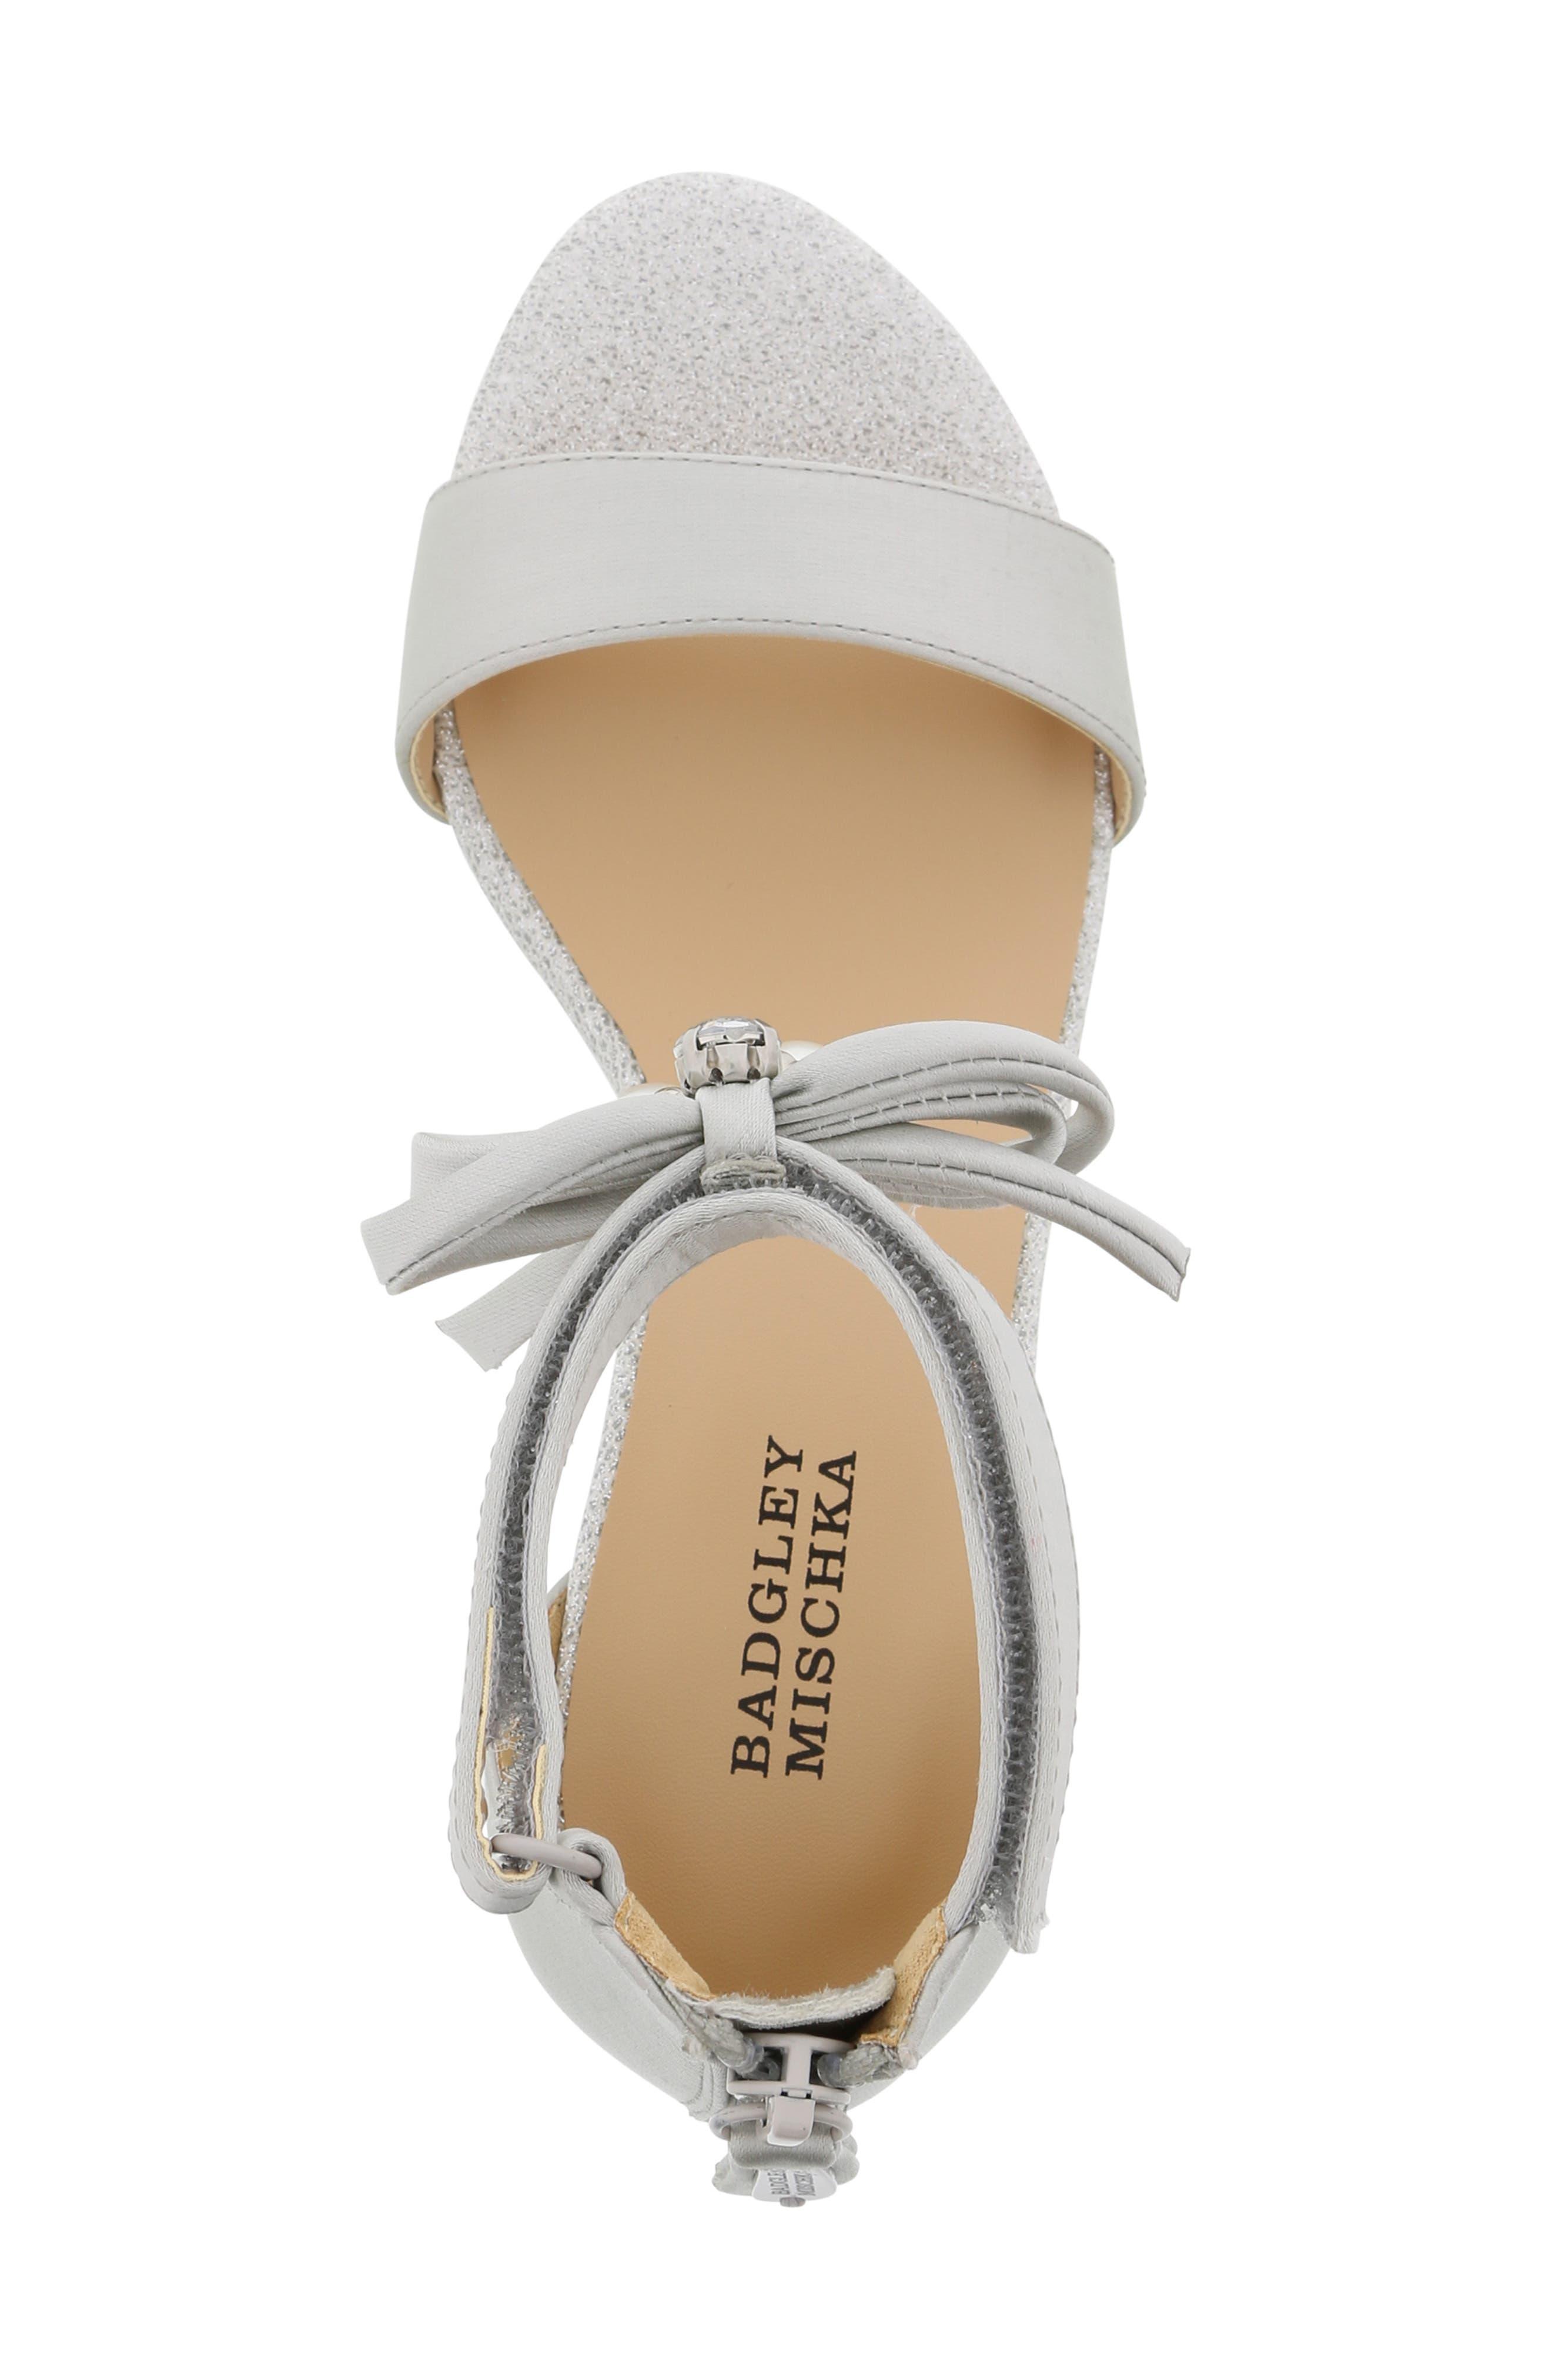 BADGLEY MISCHKA COLLECTION, Badgley Mischka Pernia Embellished Bow Sandal, Alternate thumbnail 5, color, SILVER